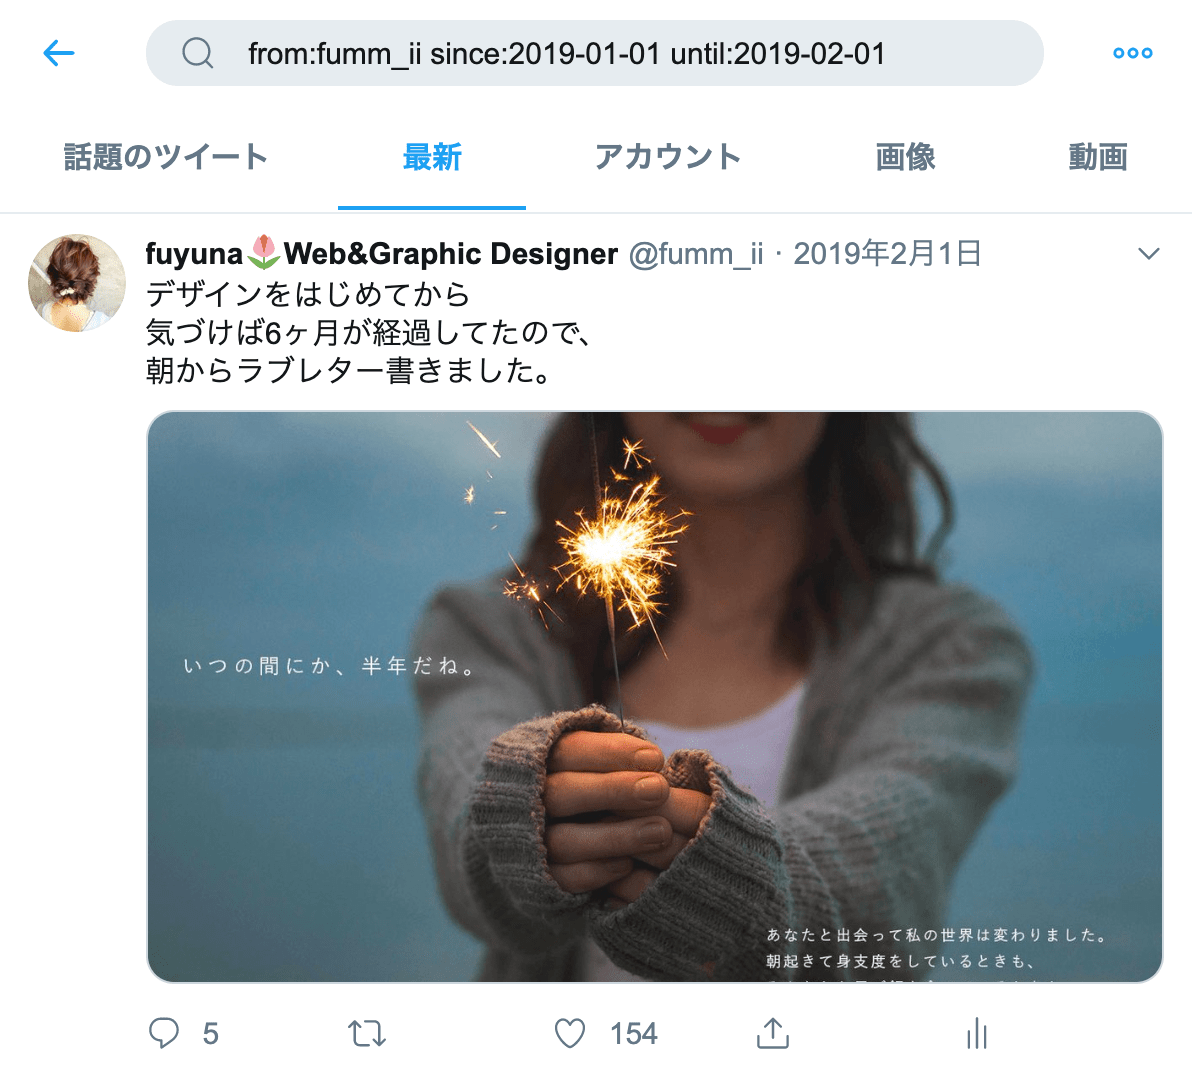 Twitterで過去のツイートを期間指定して検索するための文字列を入力した際の表示サンプル(最新のツイート優先)